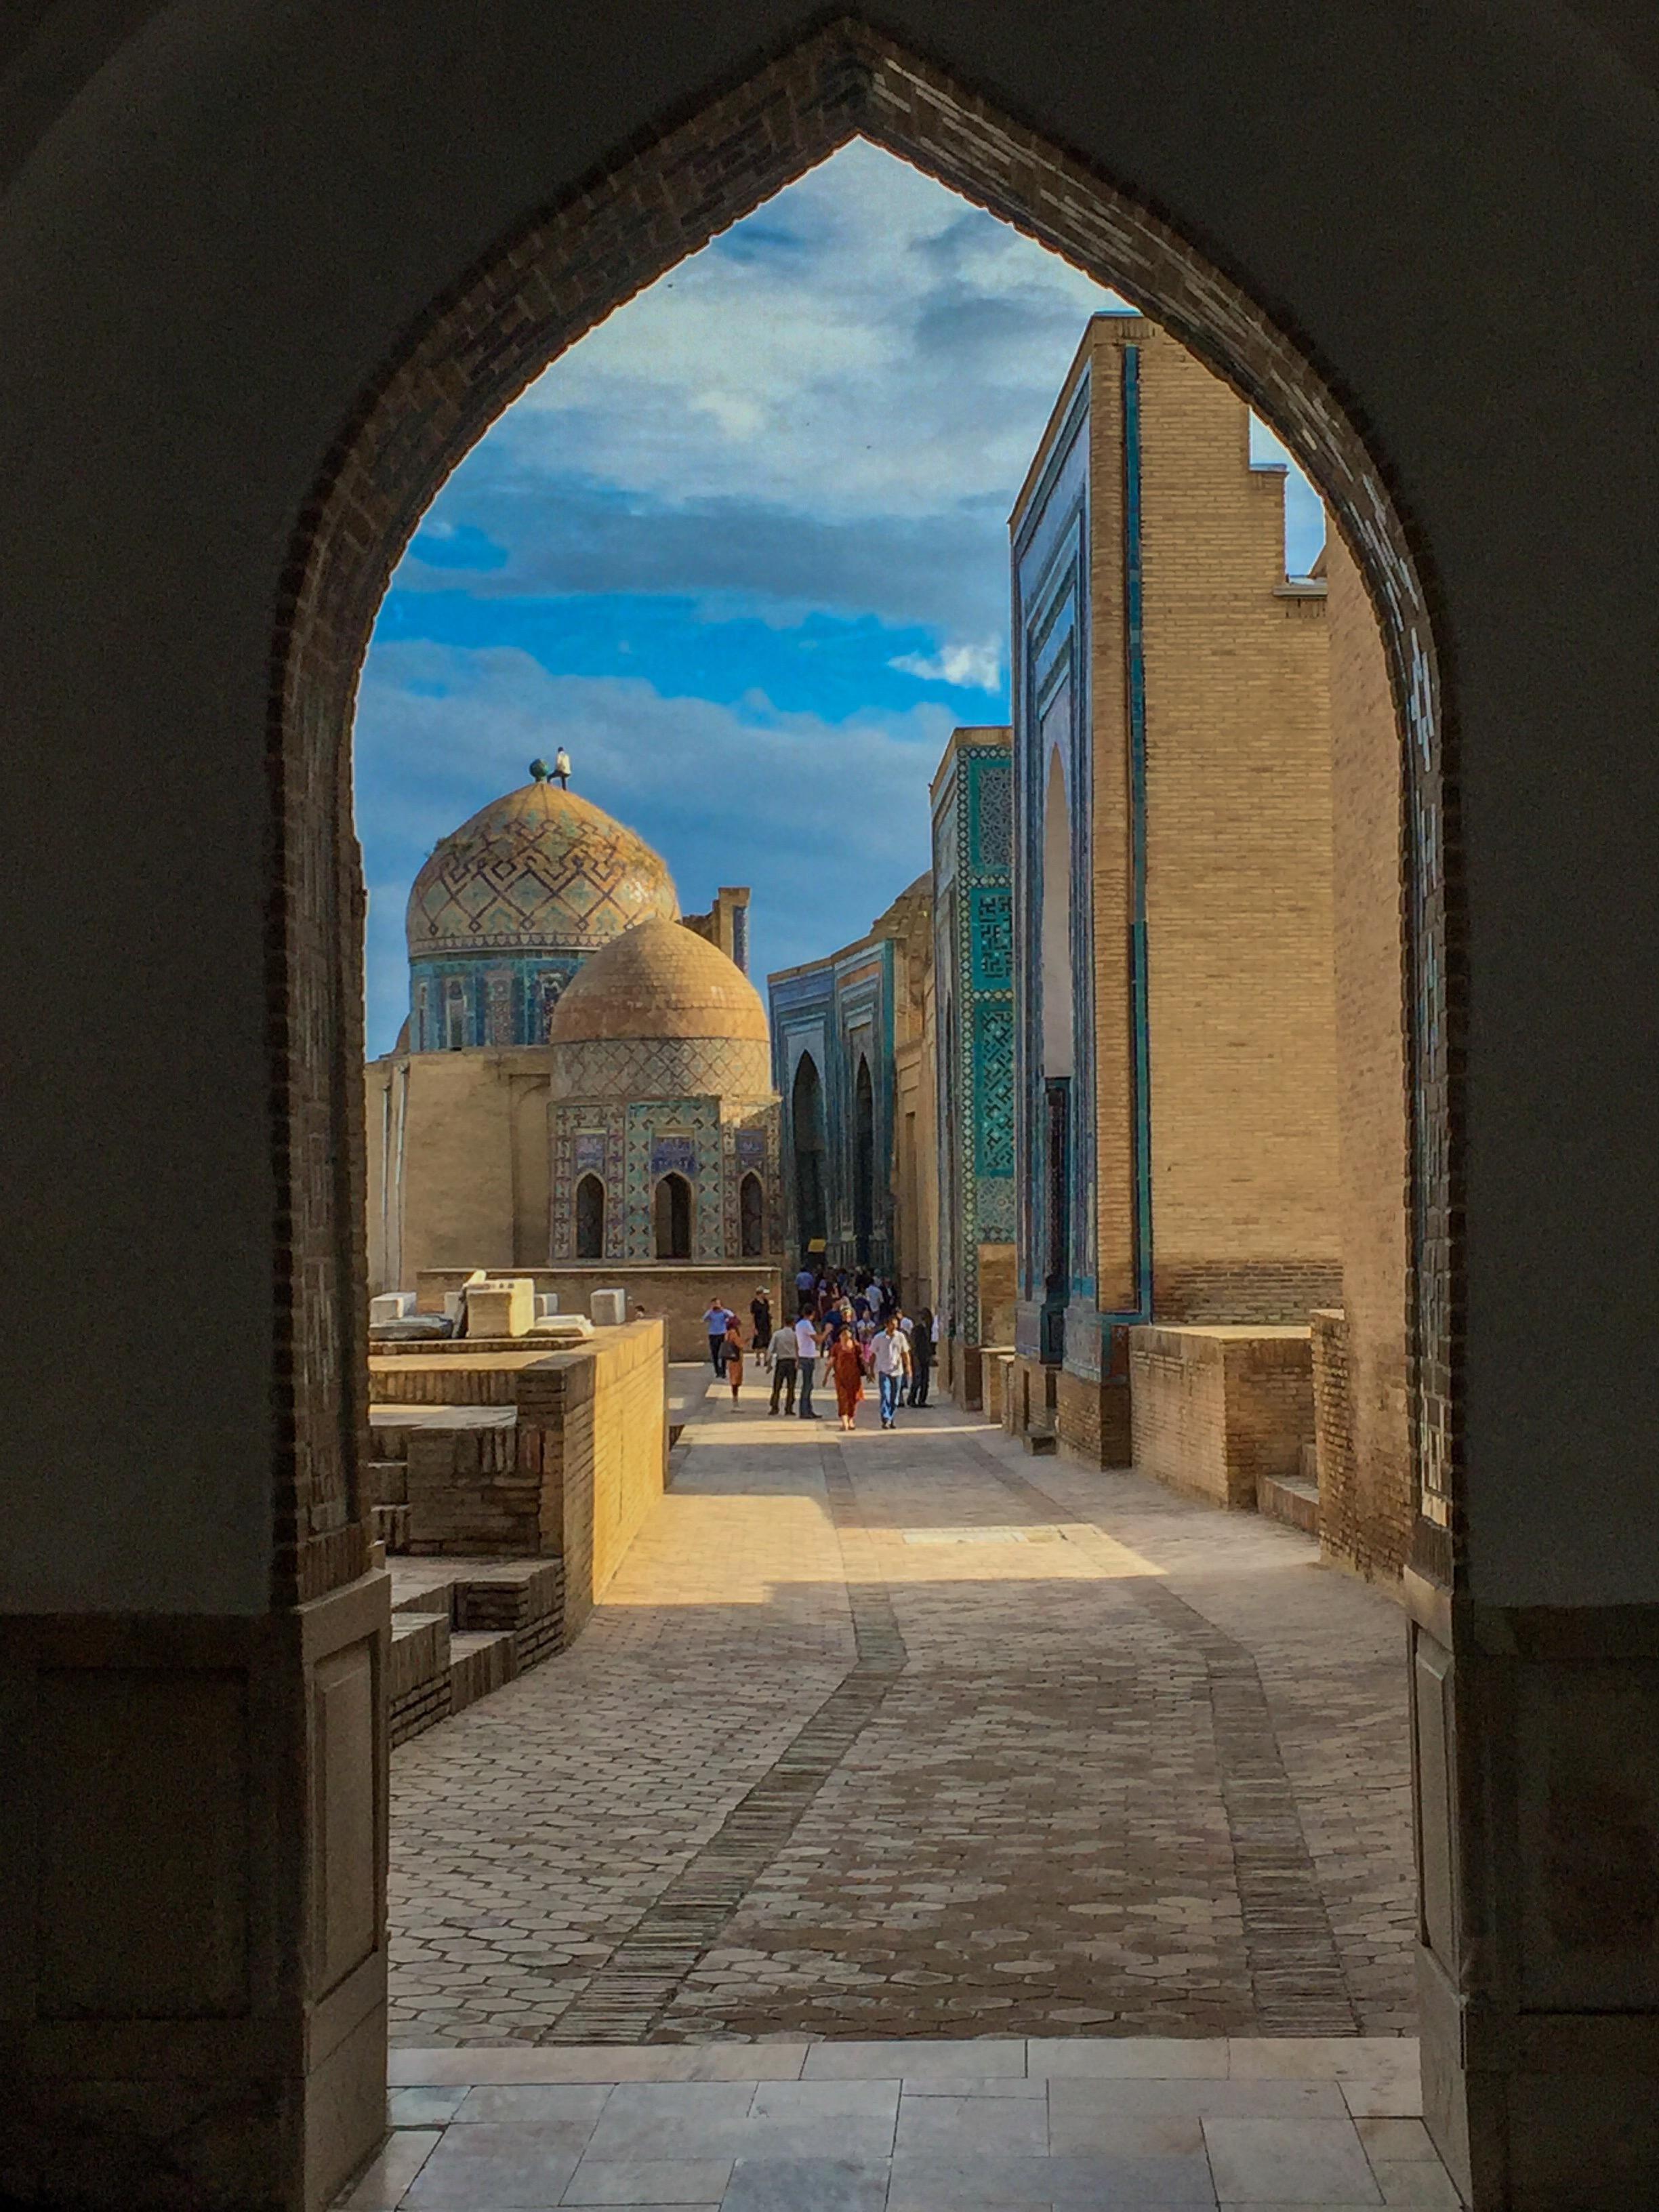 Shah-I-Kinda Mausoleum, Samarkand, Uzbekistan